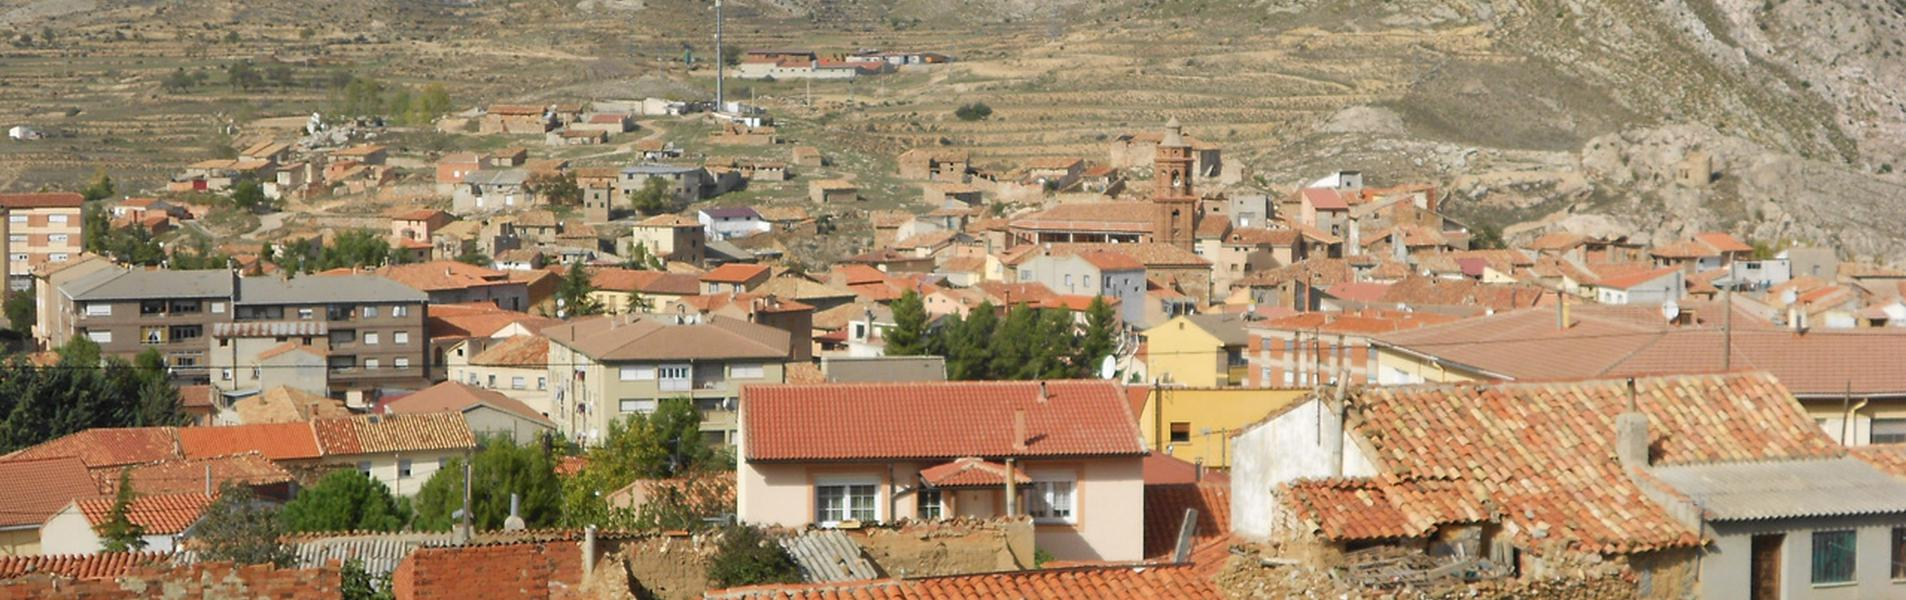 Villanueva del Rebollar de la Sierra